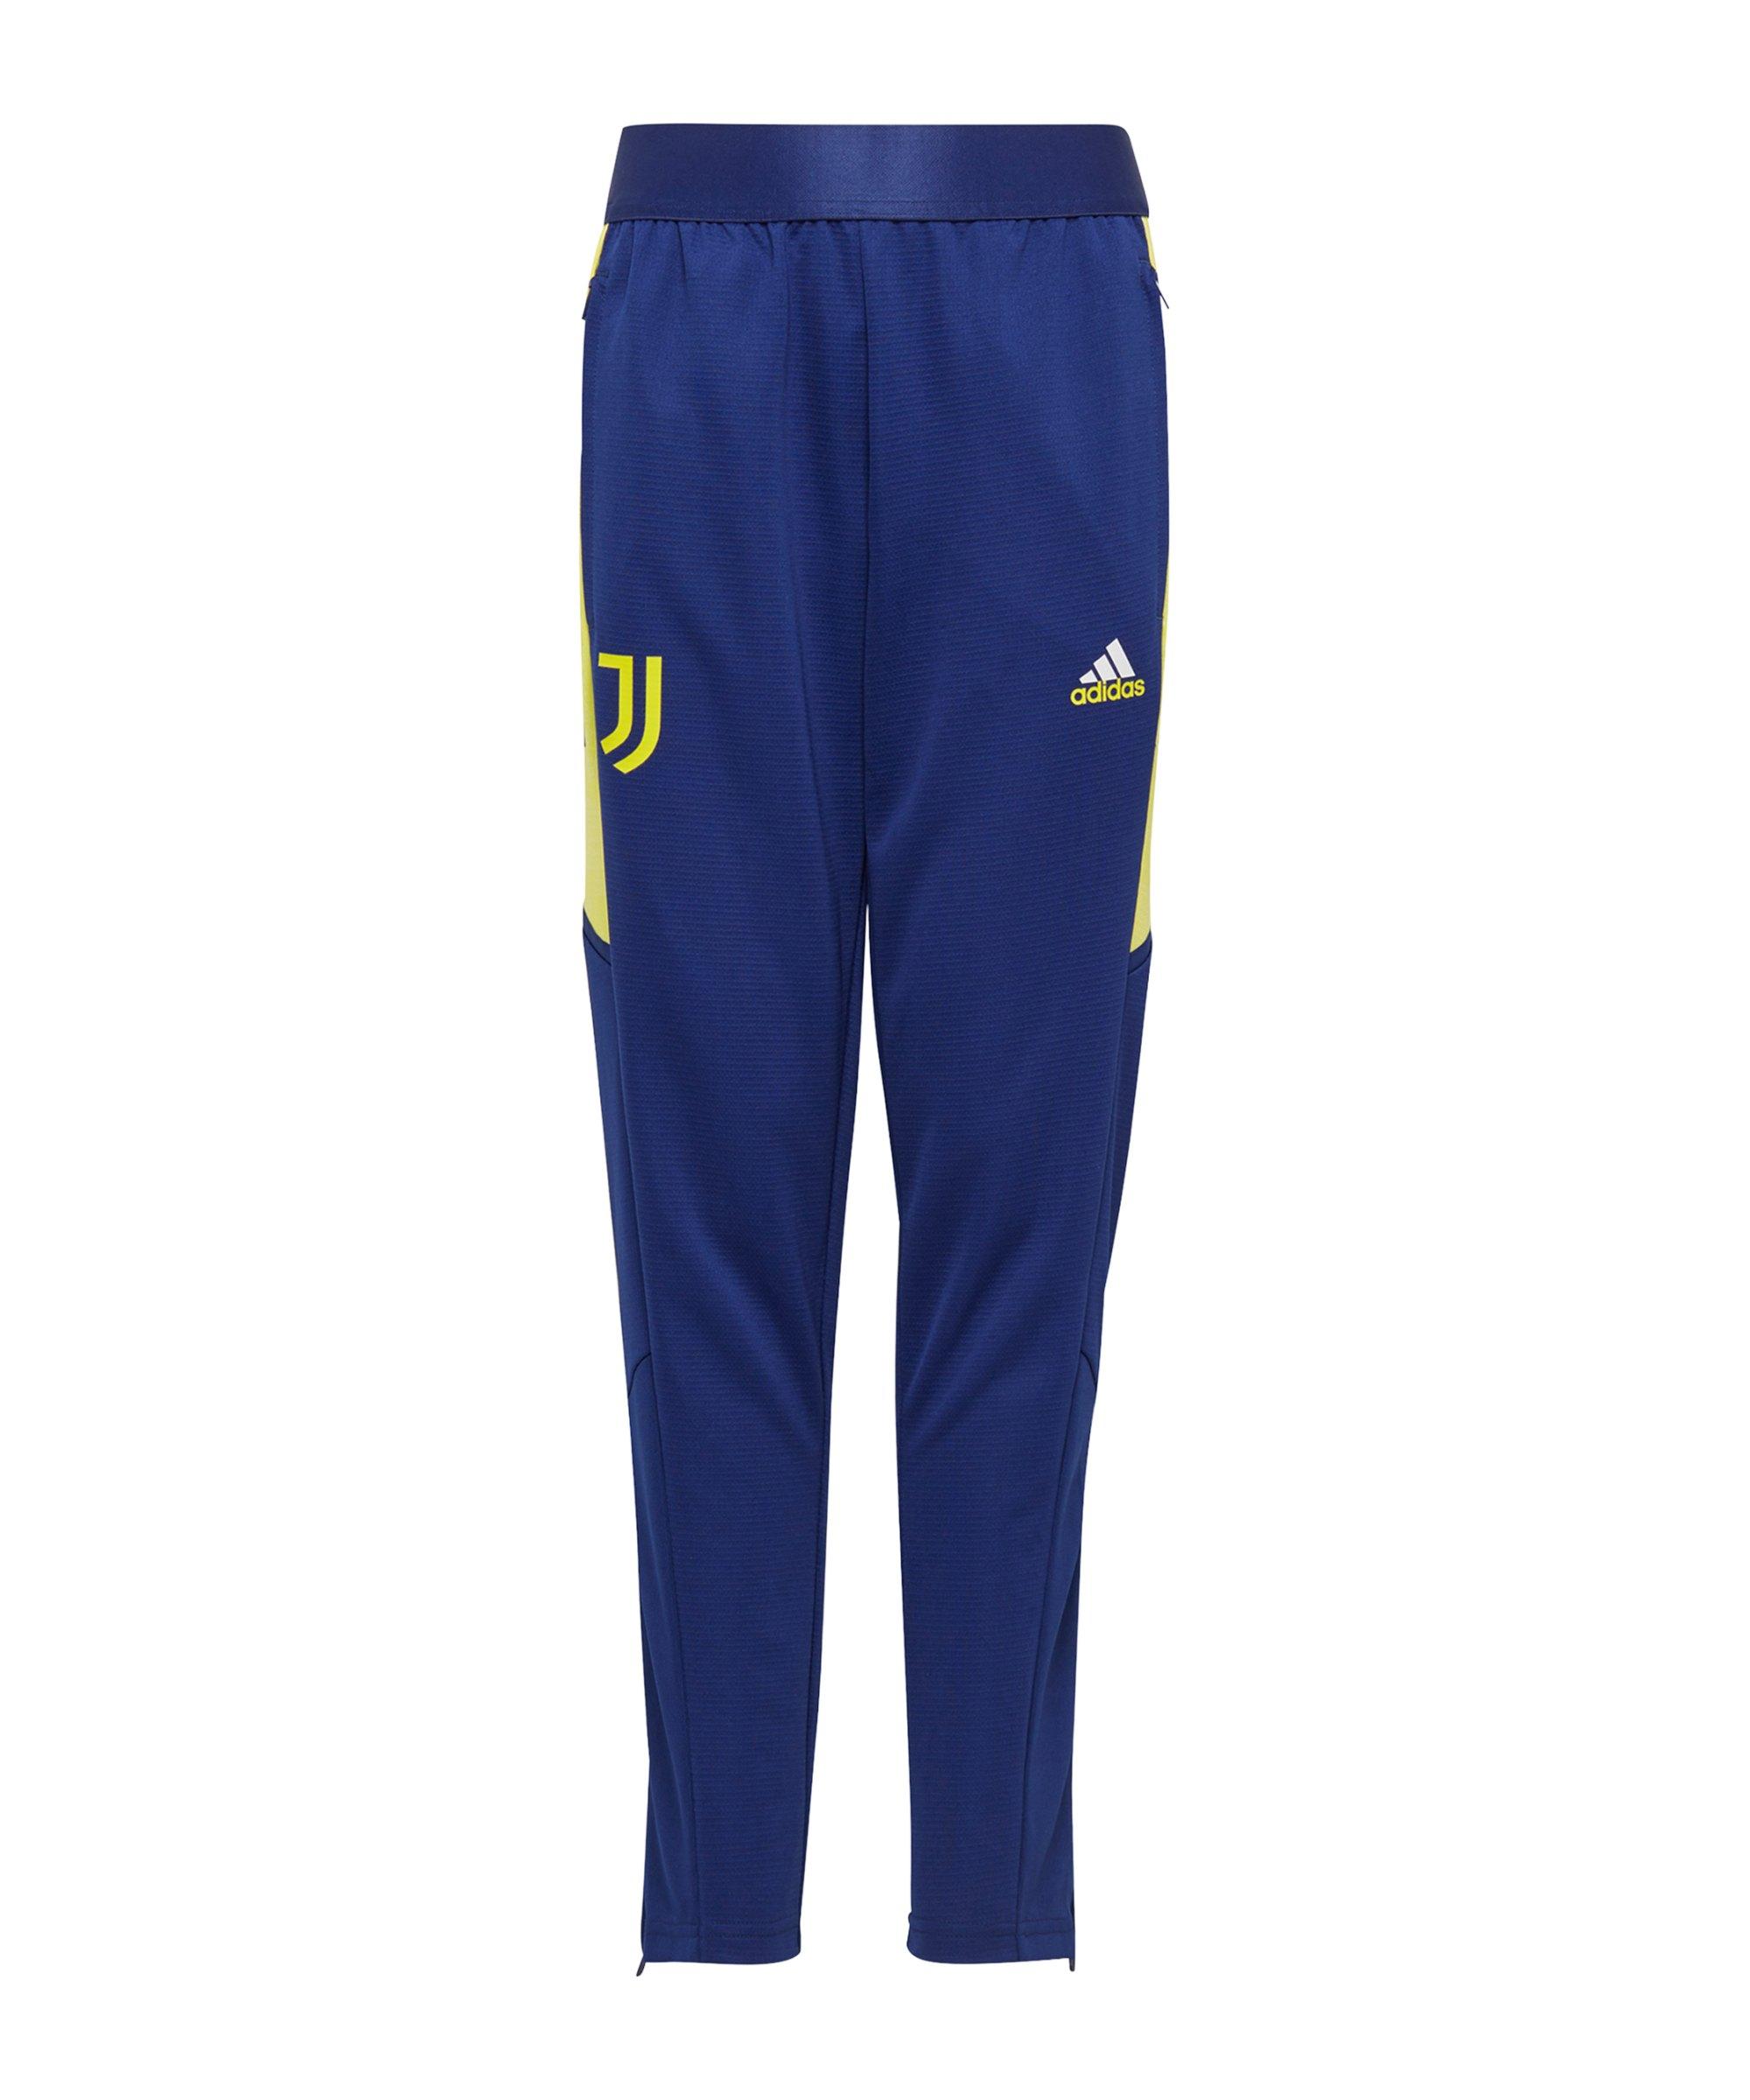 adidas Juventus Turin Trainingshose Kids Blau Gelb - gelb